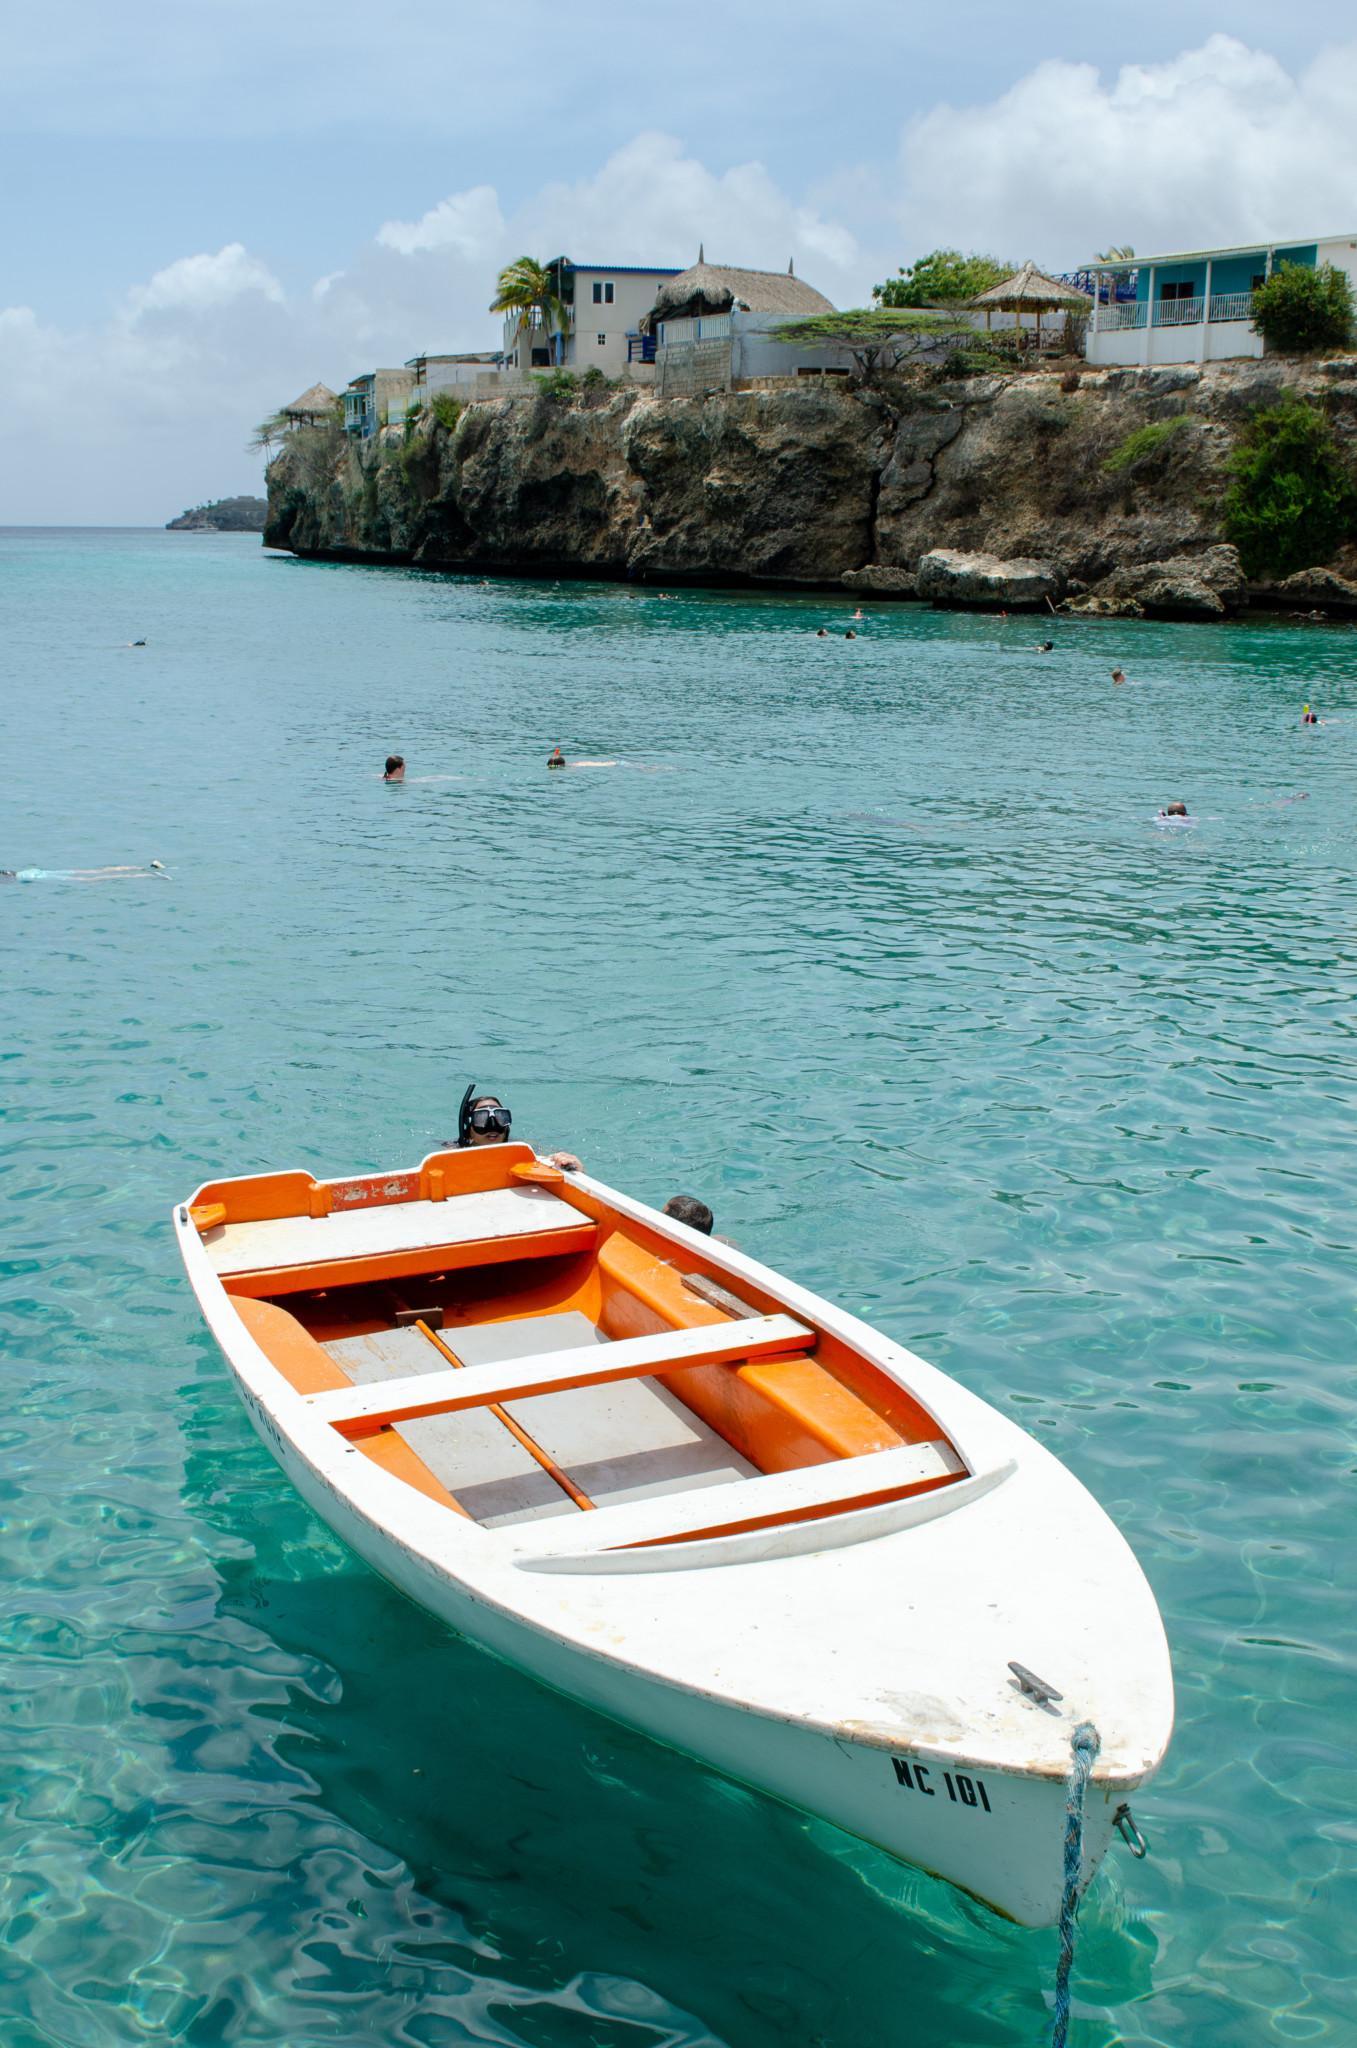 Am Playa Piskado auf Curacao kann man gut schnorcheln